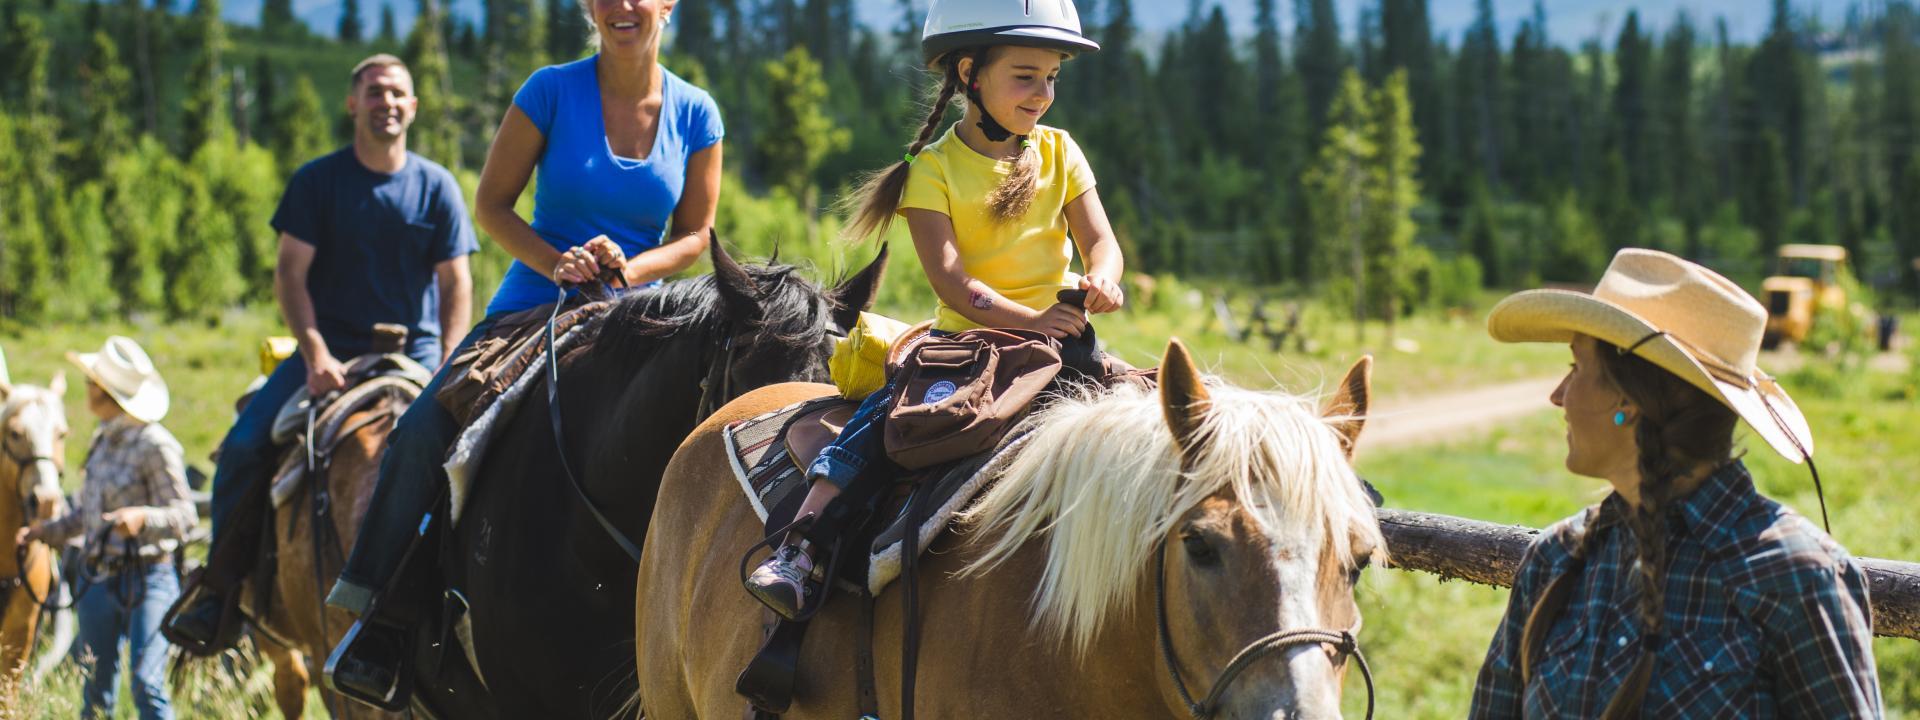 Horseback riding in Winter Park, Colorado